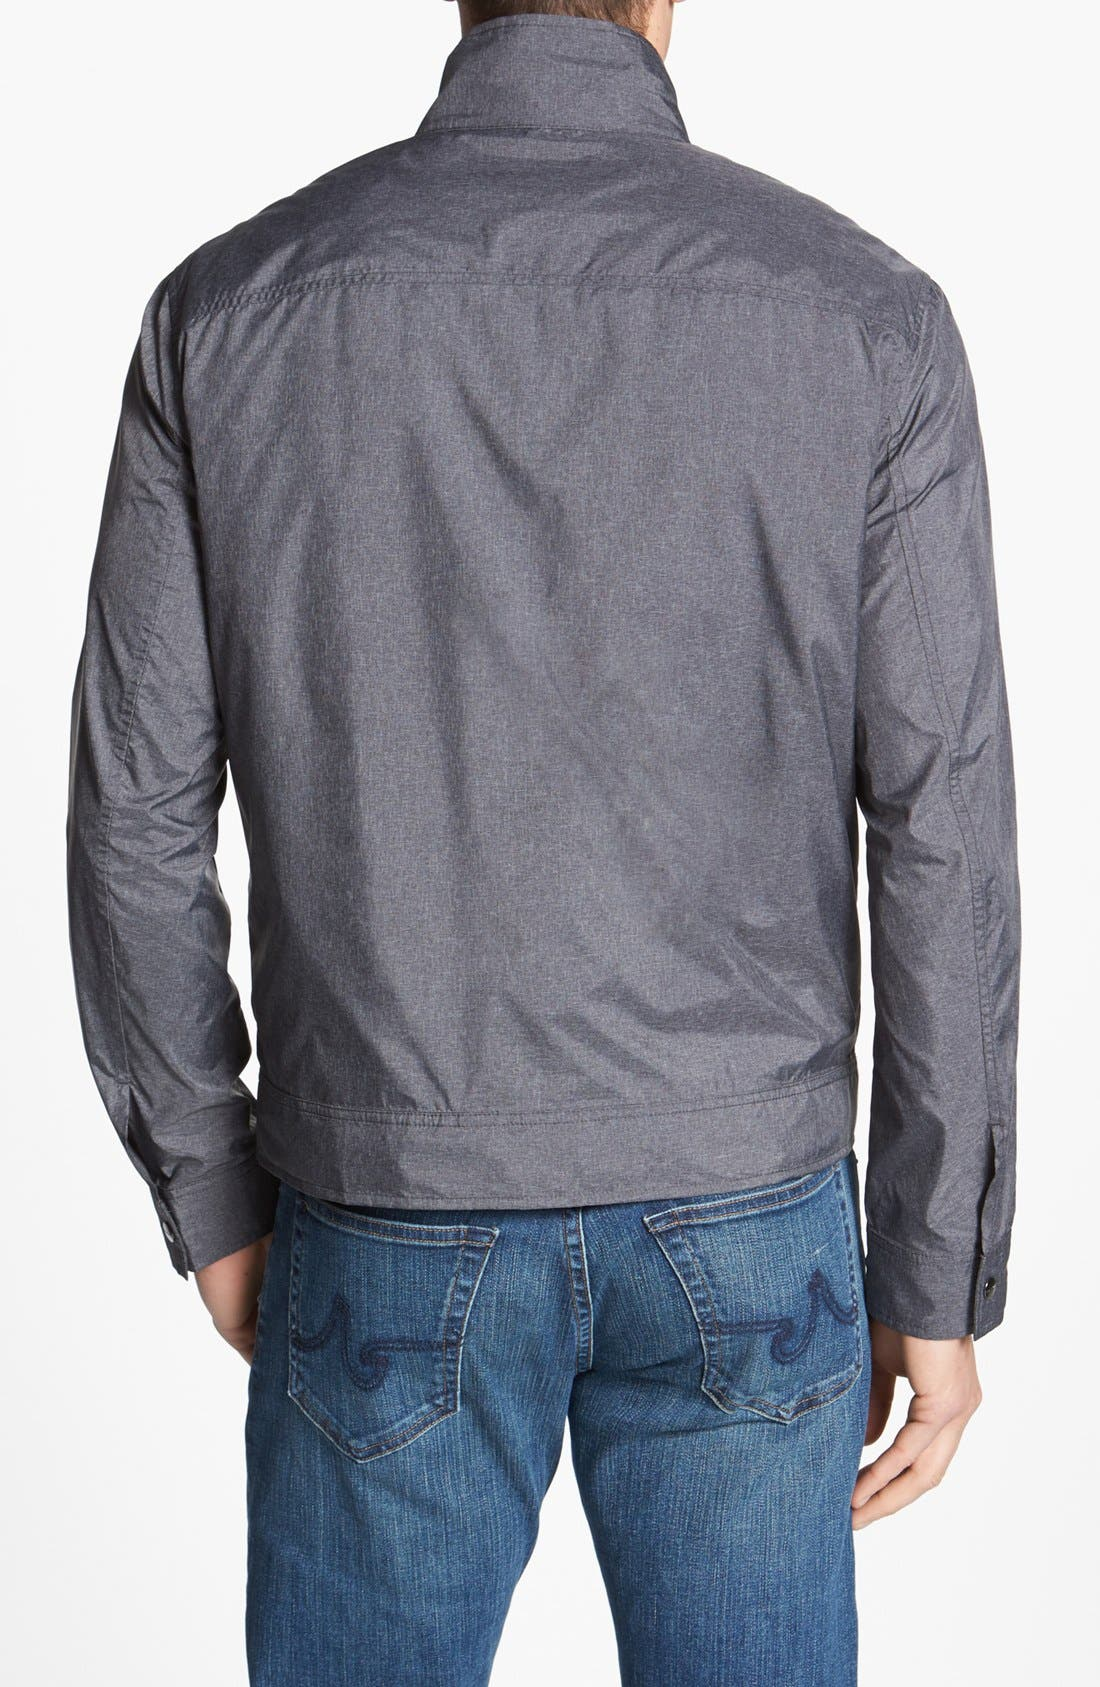 Alternate Image 2  - Michael Kors Trim Fit 3-in-1 Jacket